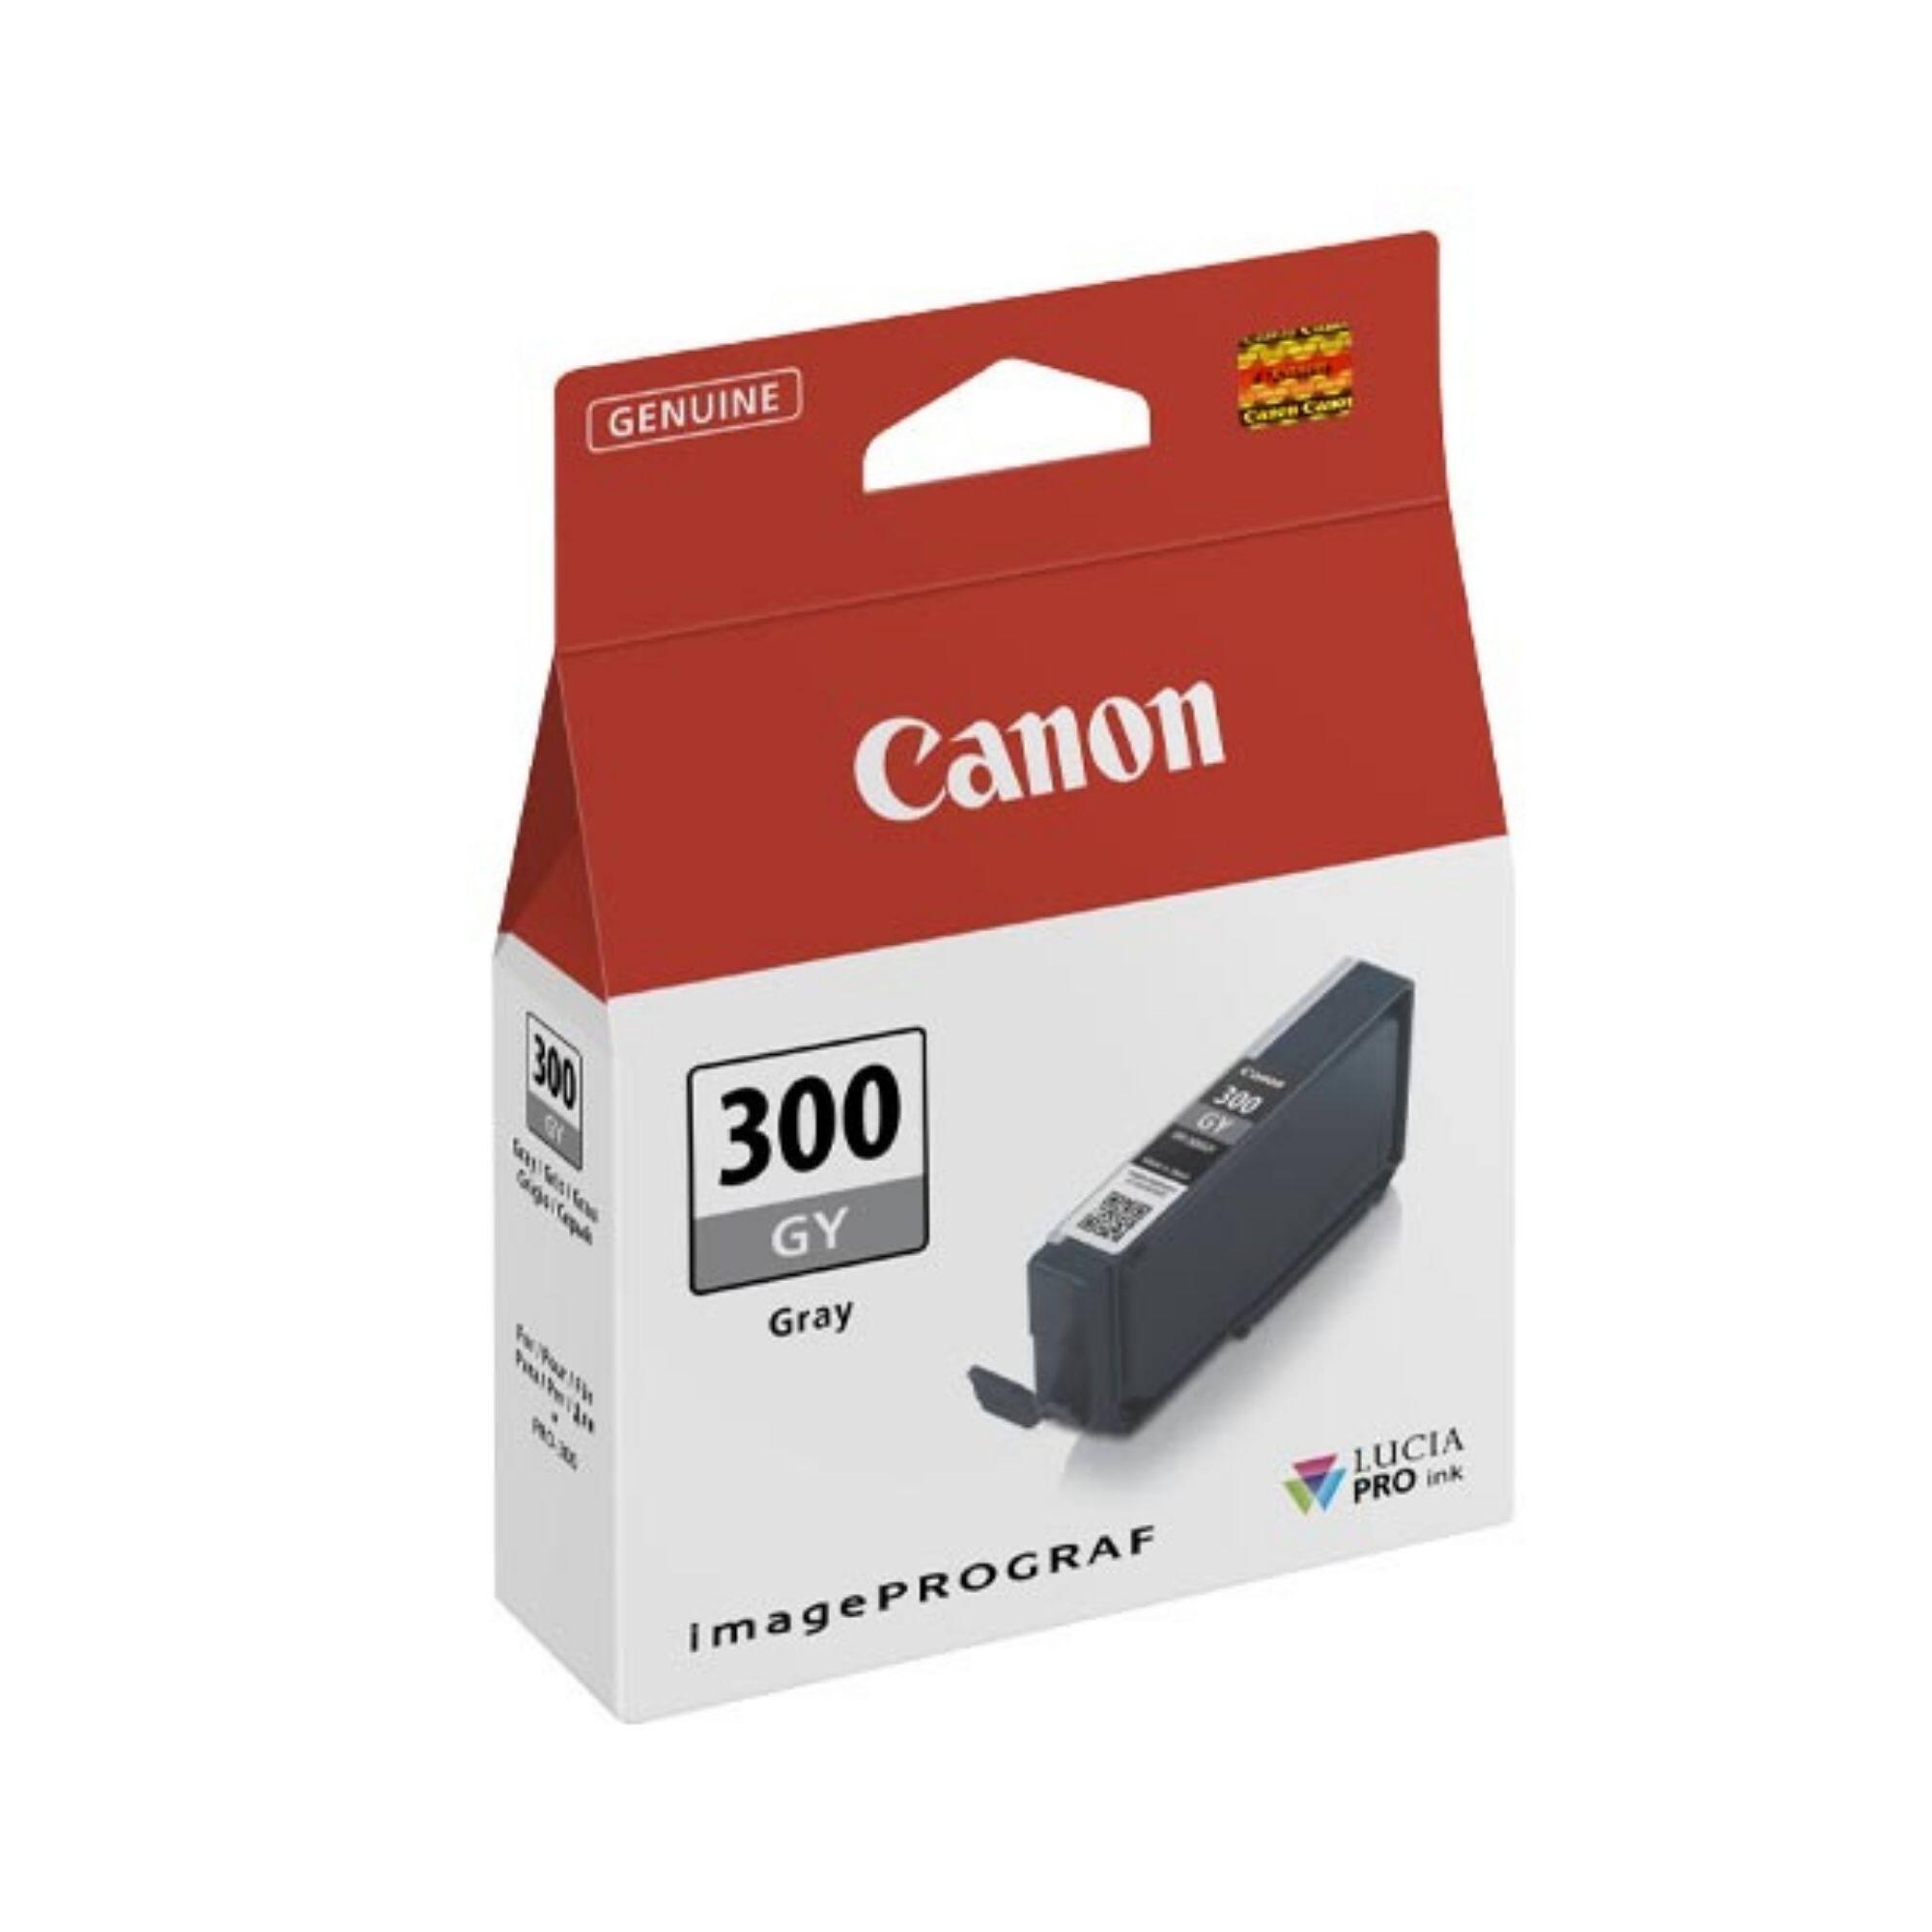 Canon PFI-300 Grey Cartridge (14.4 ml) for PRO-300 Printer